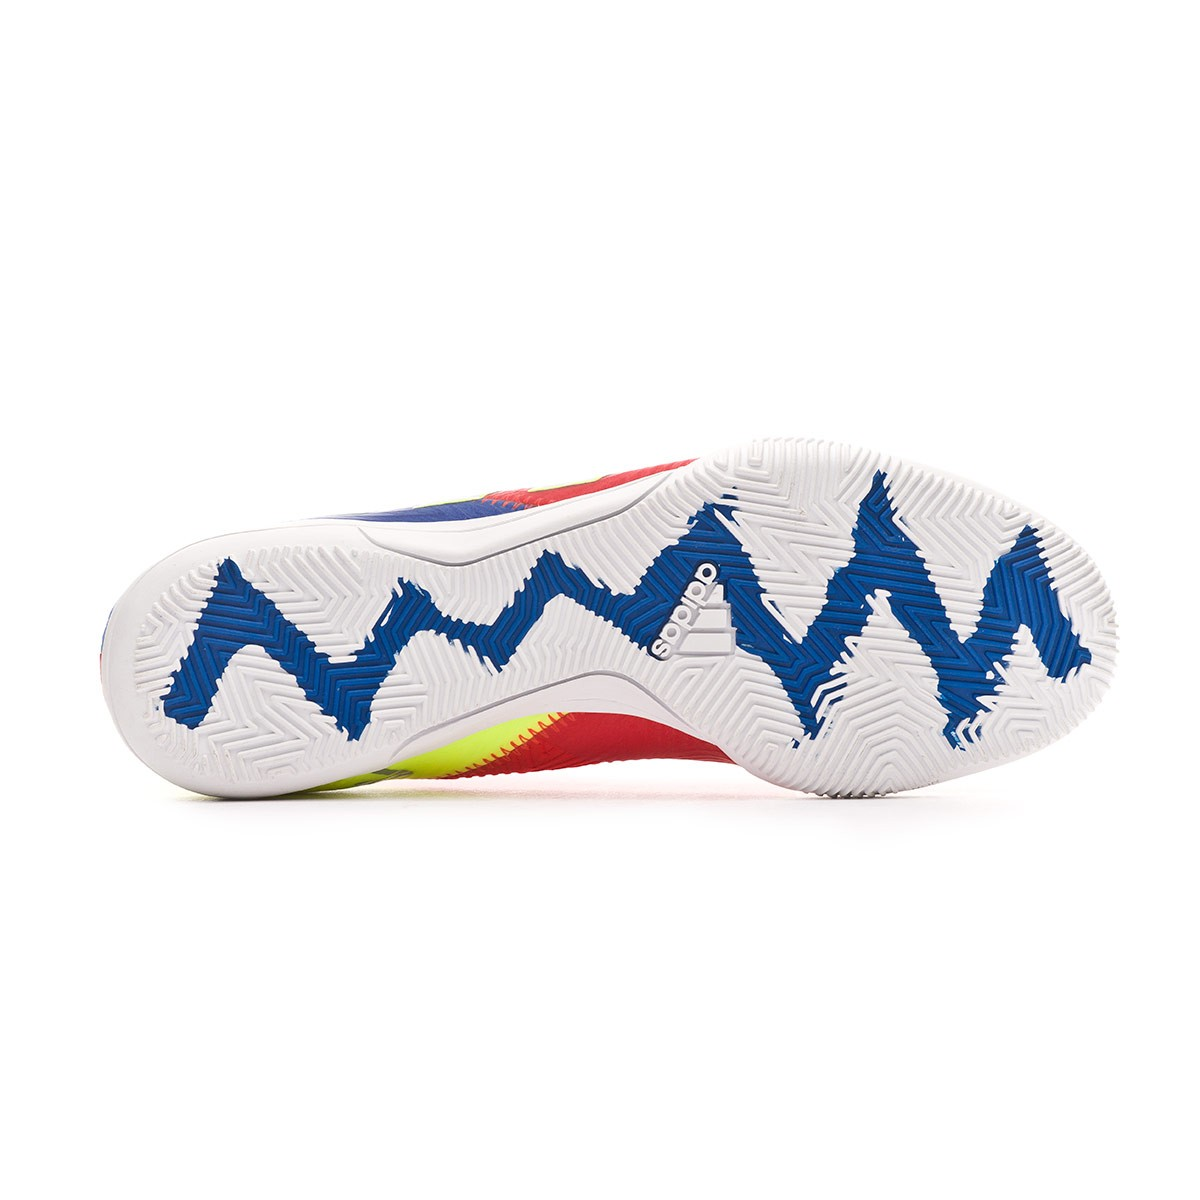 fae7c818503af Tenis adidas Nemeziz Messi Tango 18.3 IN Active red-Silver metallic-Football  blue - Tienda de fútbol Fútbol Emotion